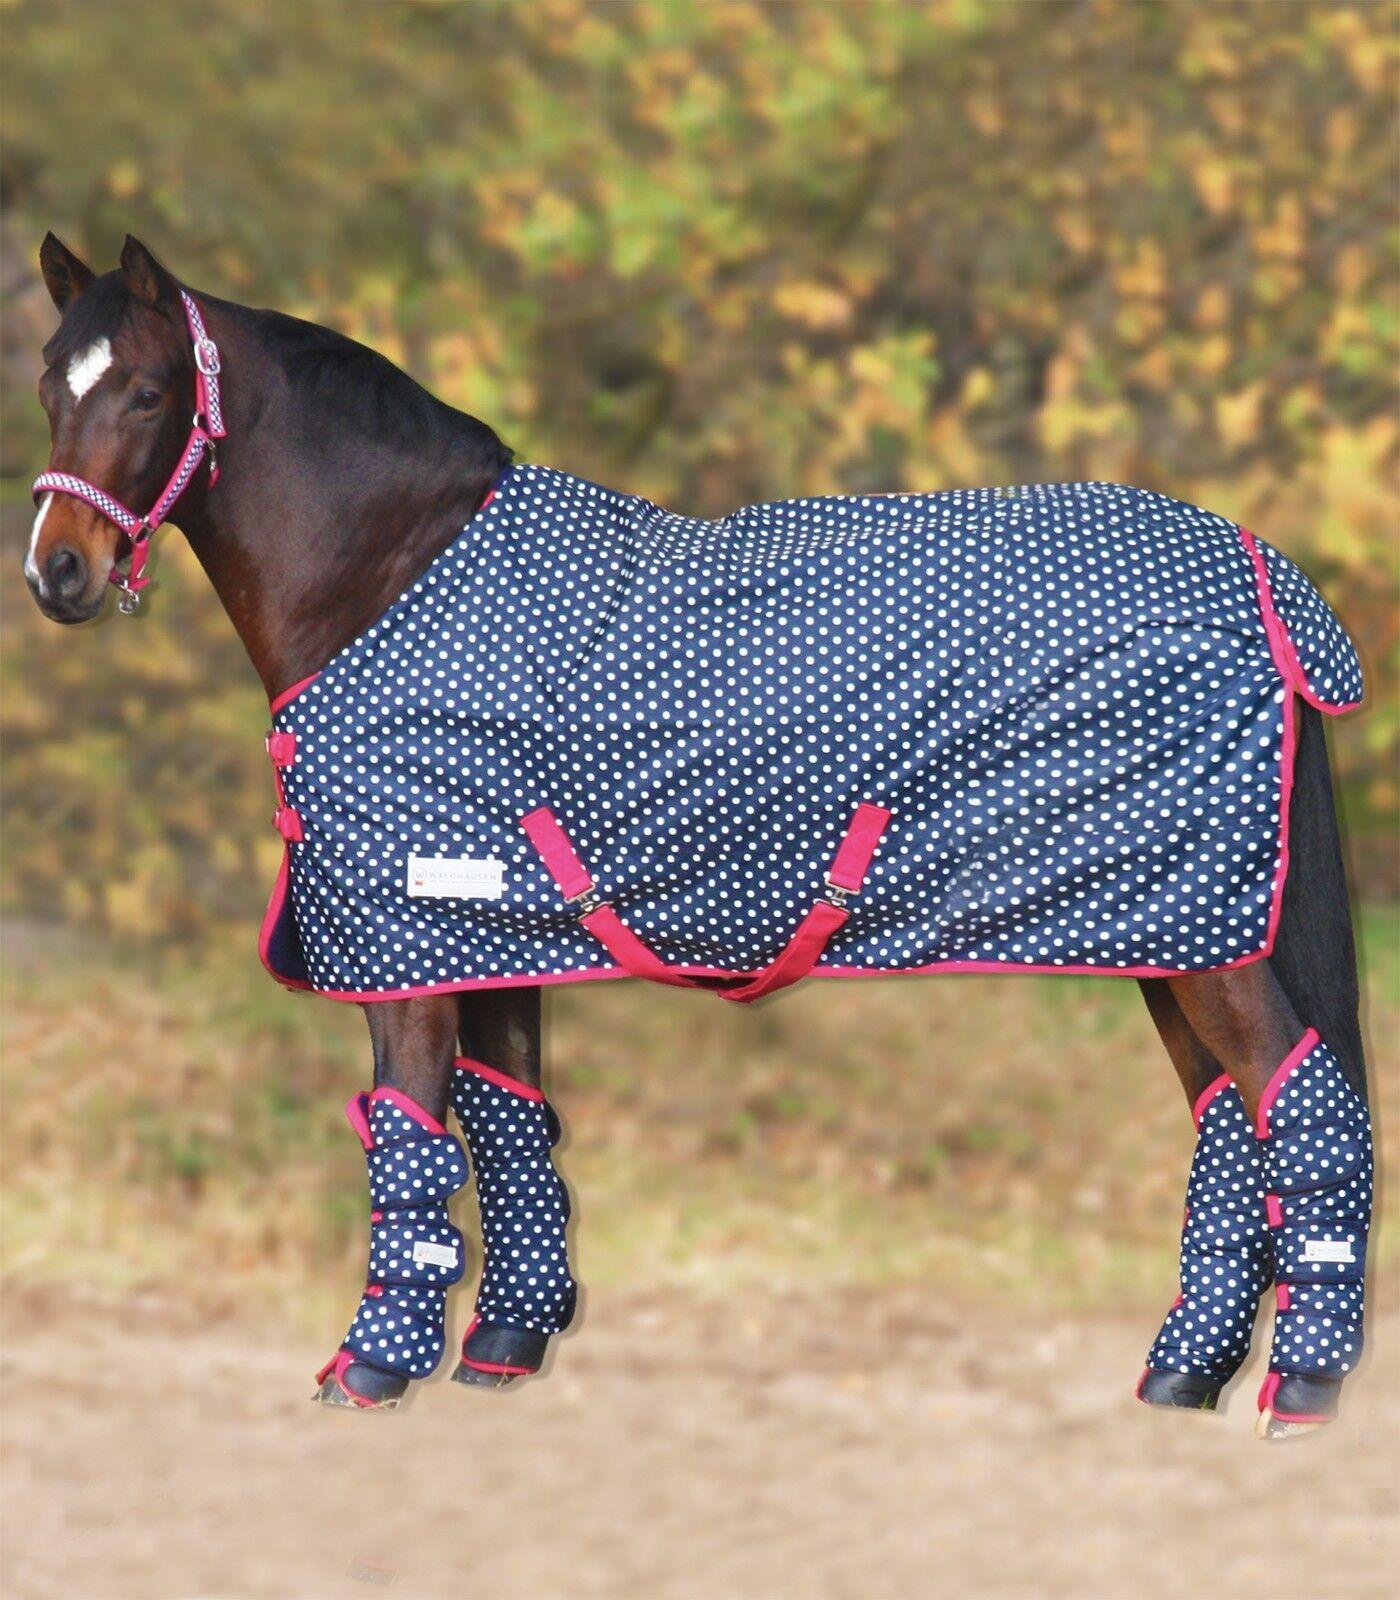 Manta Exteriores, de Lluvia, Ganadero Pony Unicorn 100G Relleno, Impermeable